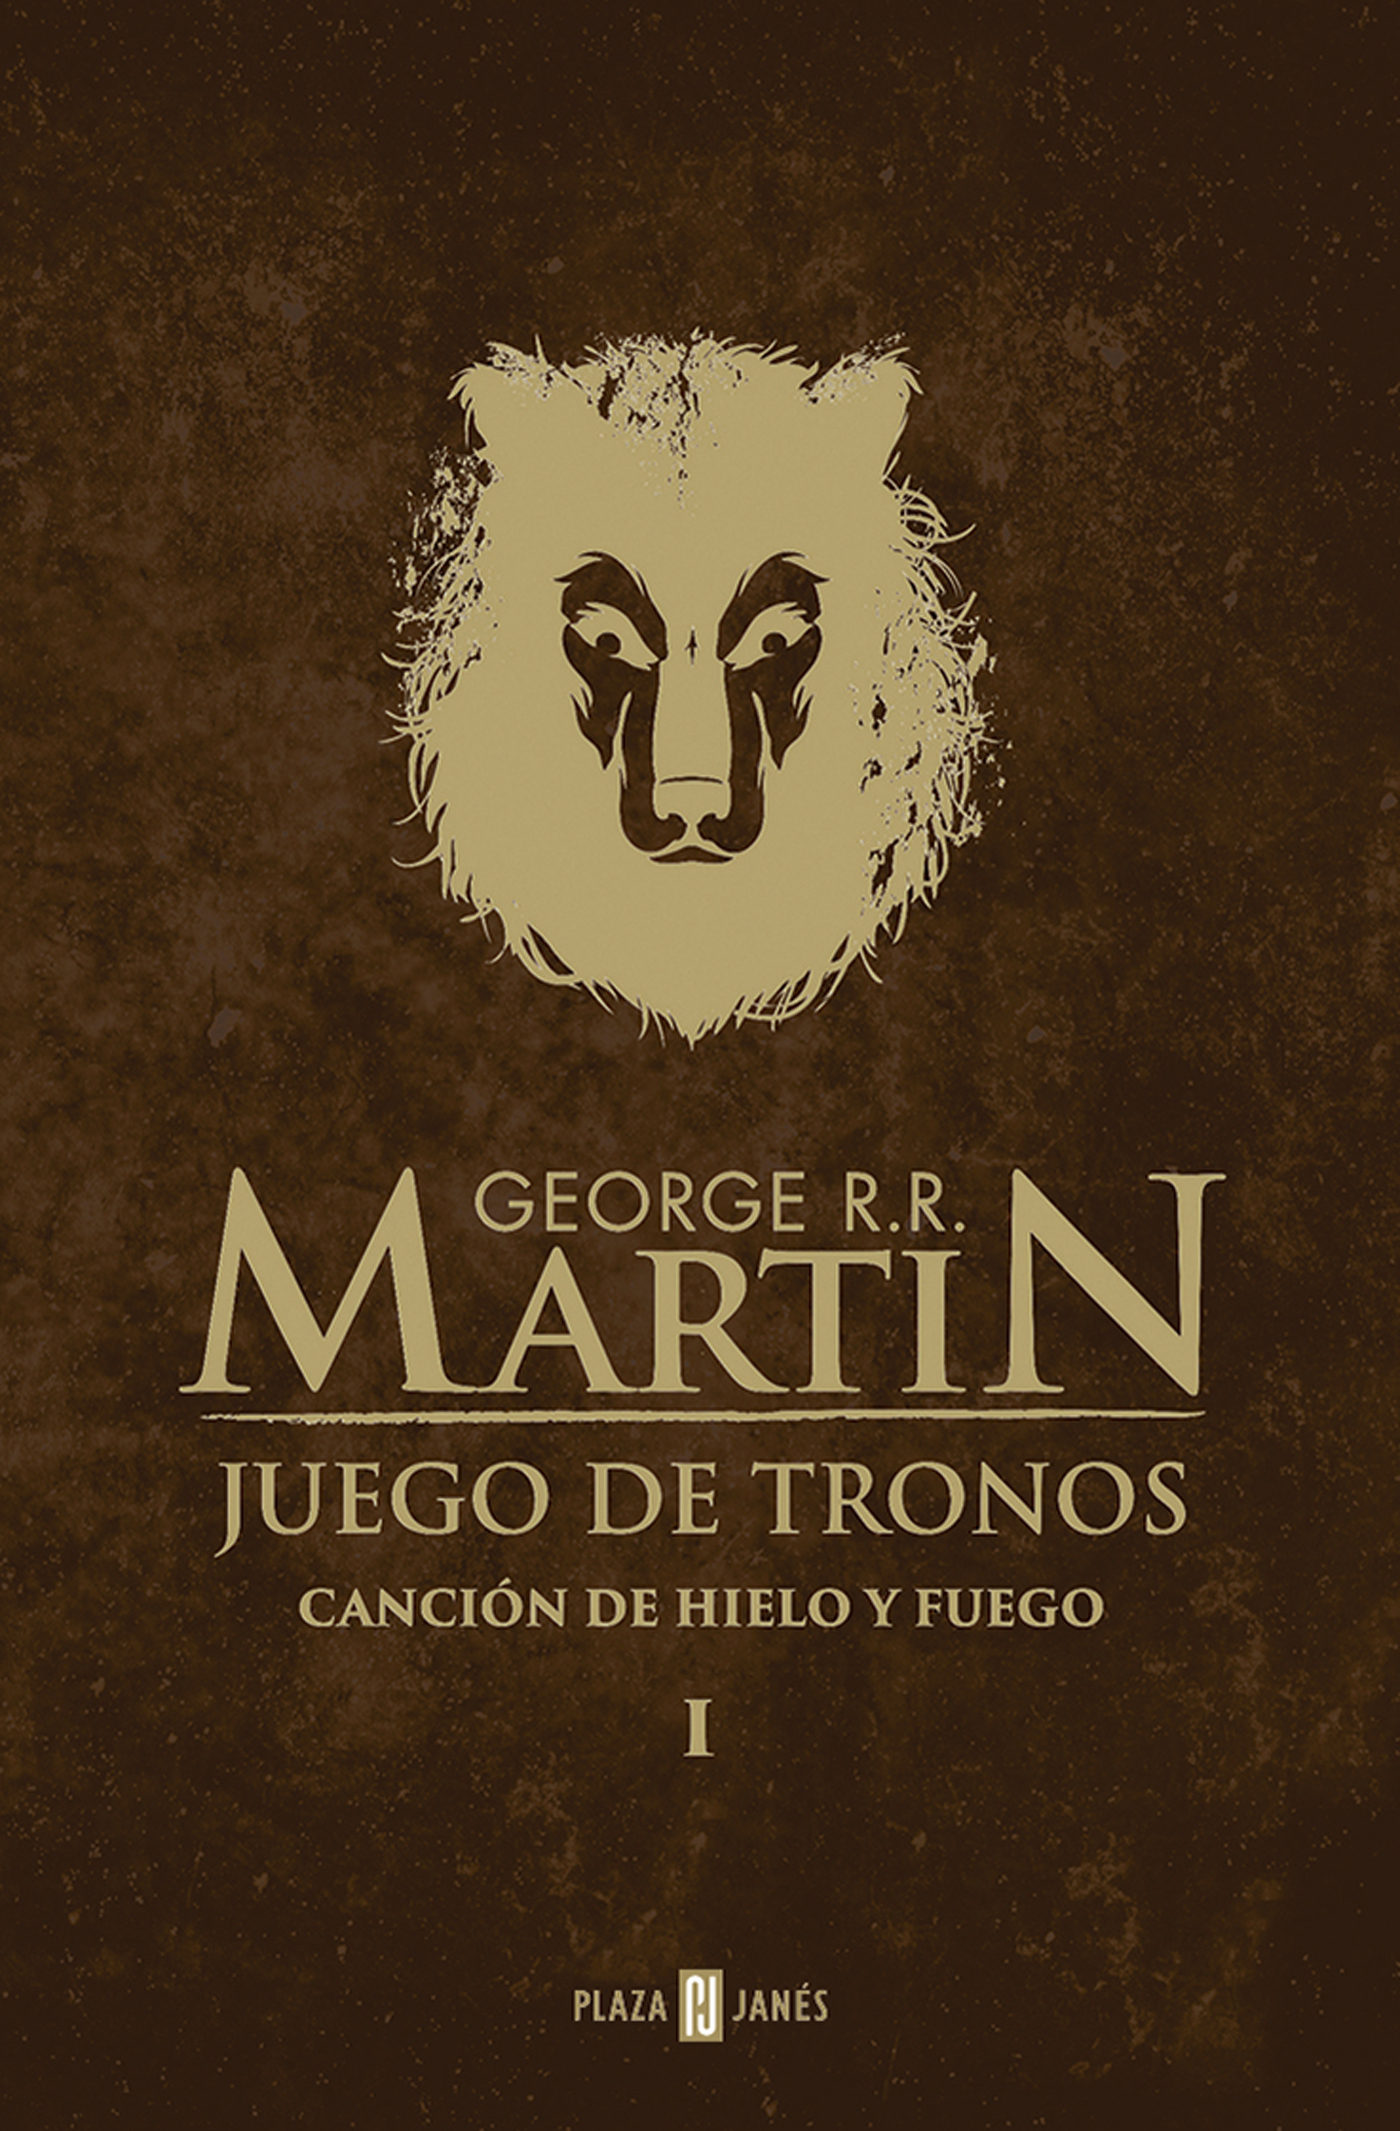 Livro Game Of Thrones Pdf Gratis